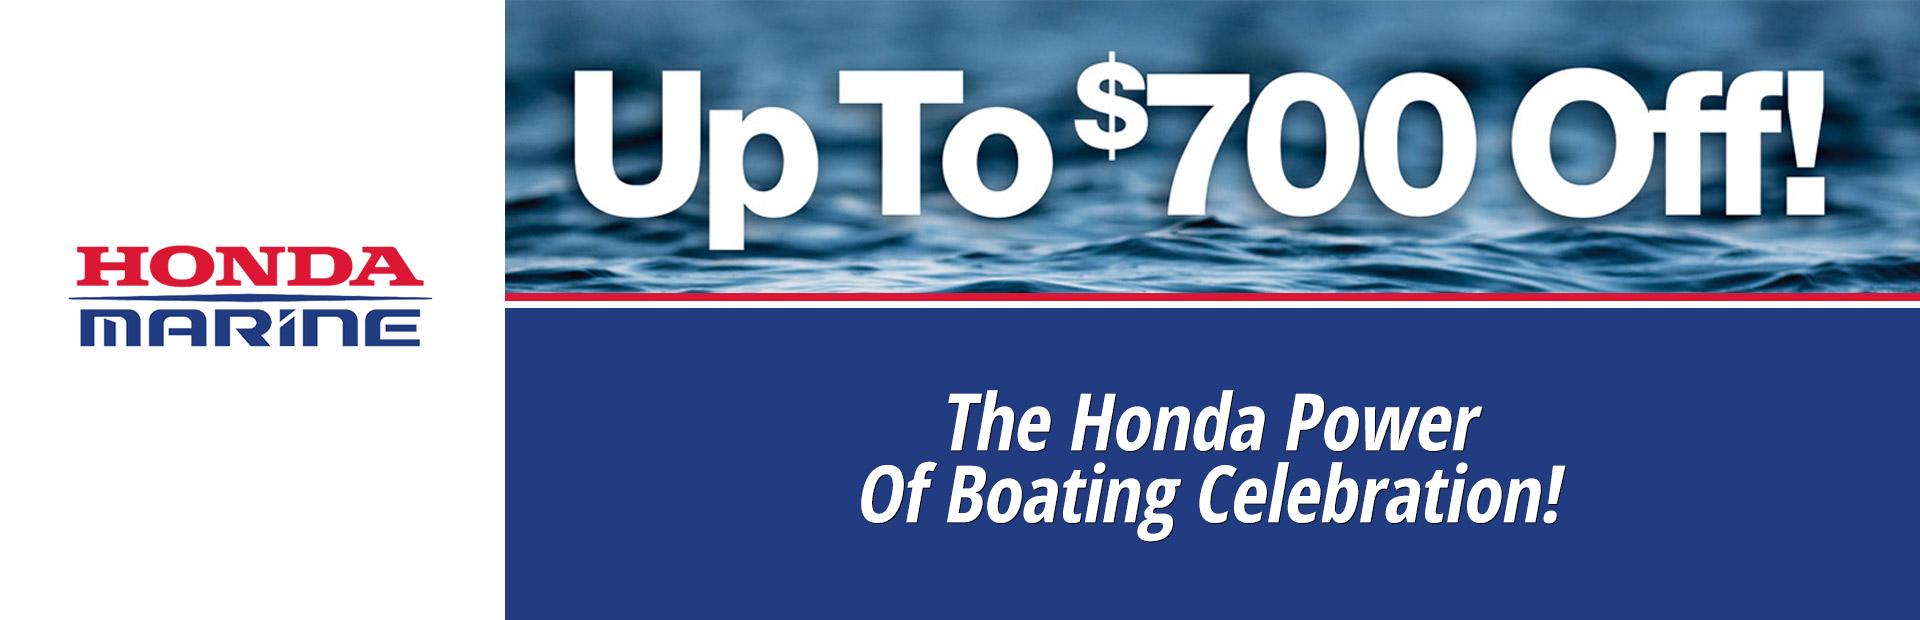 Home Windward Boats And Outboards Kailua Hi 866 750 6064